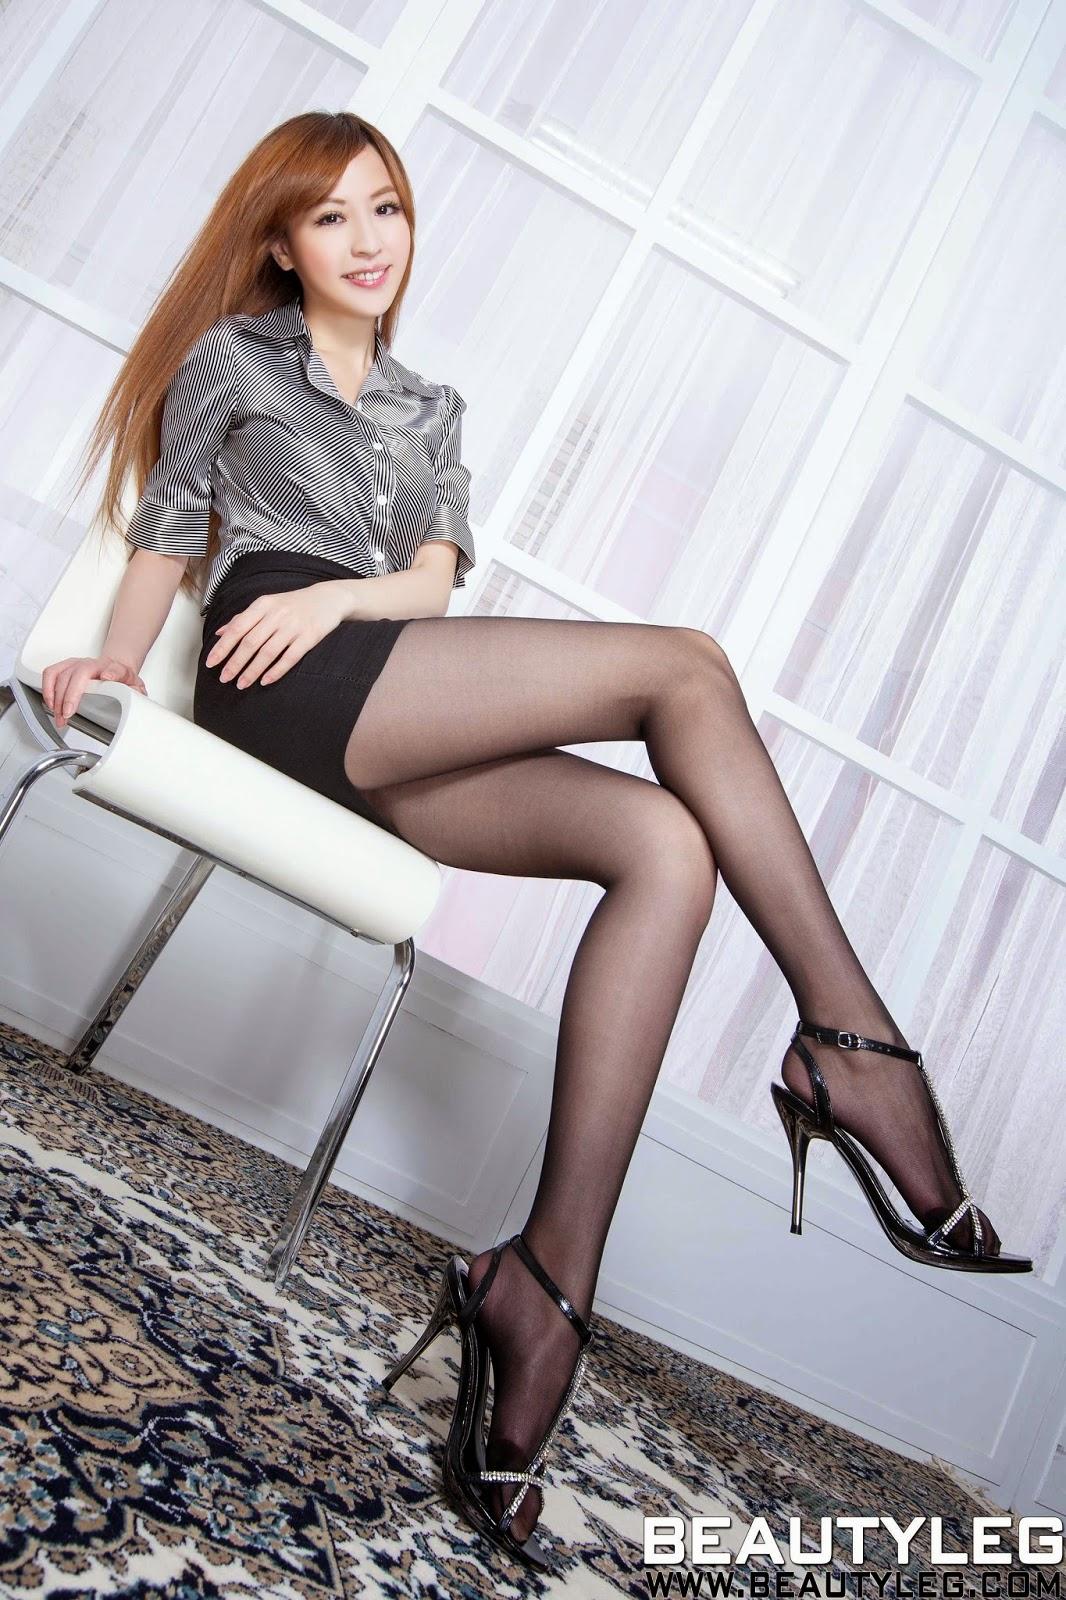 Top 10 Online Chinese Girls amp Women Dating Websites